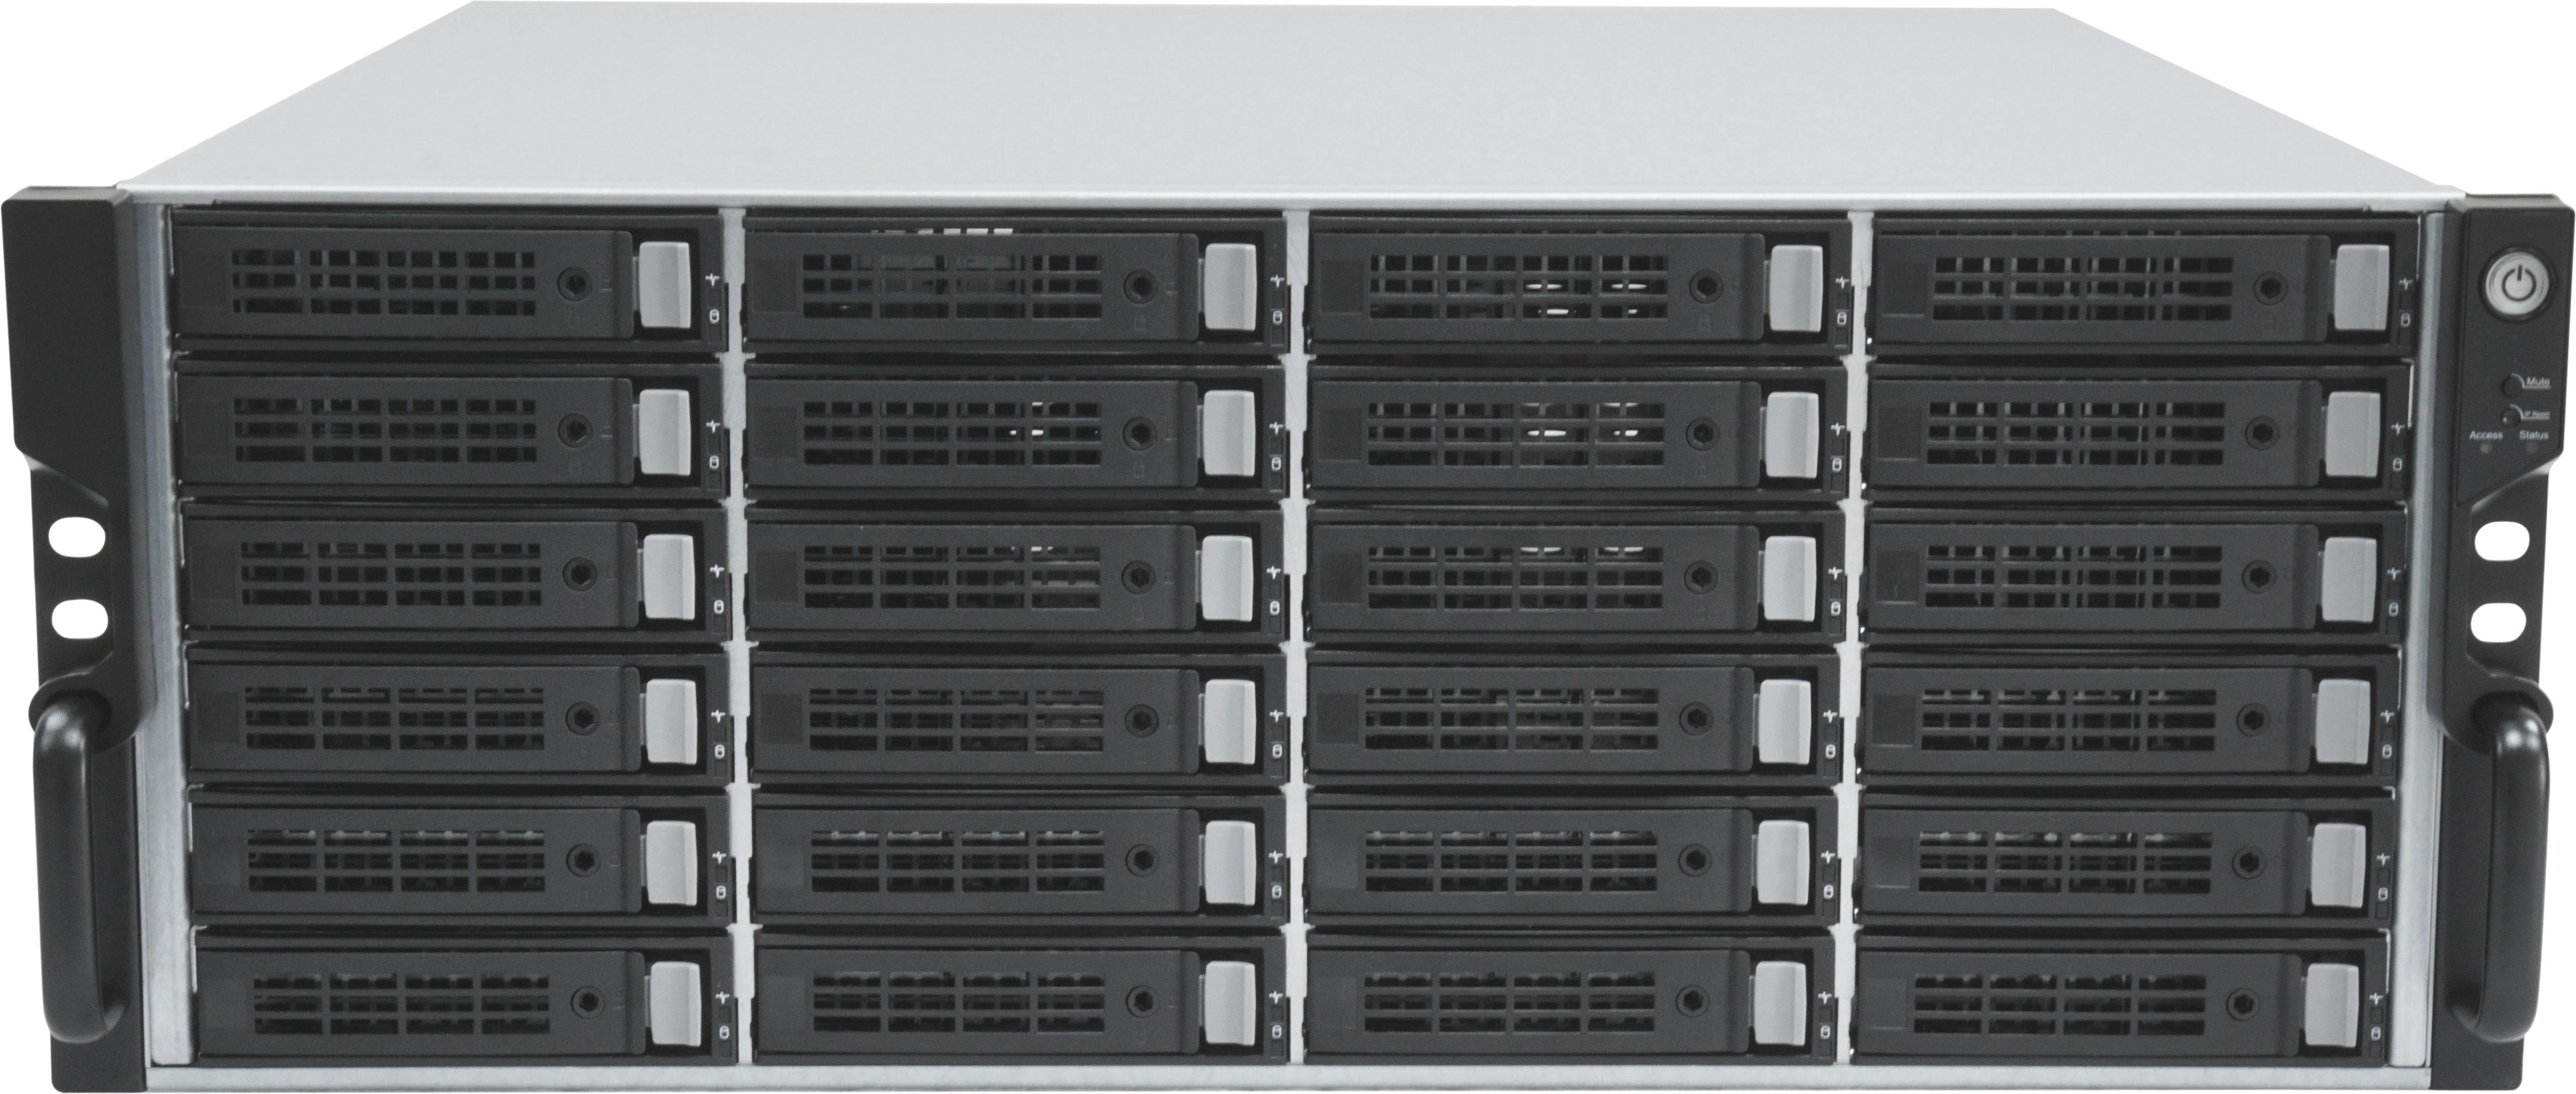 Dell EqualLogic PS6500xv Virtualized iSCSI SAN Storage Array ...